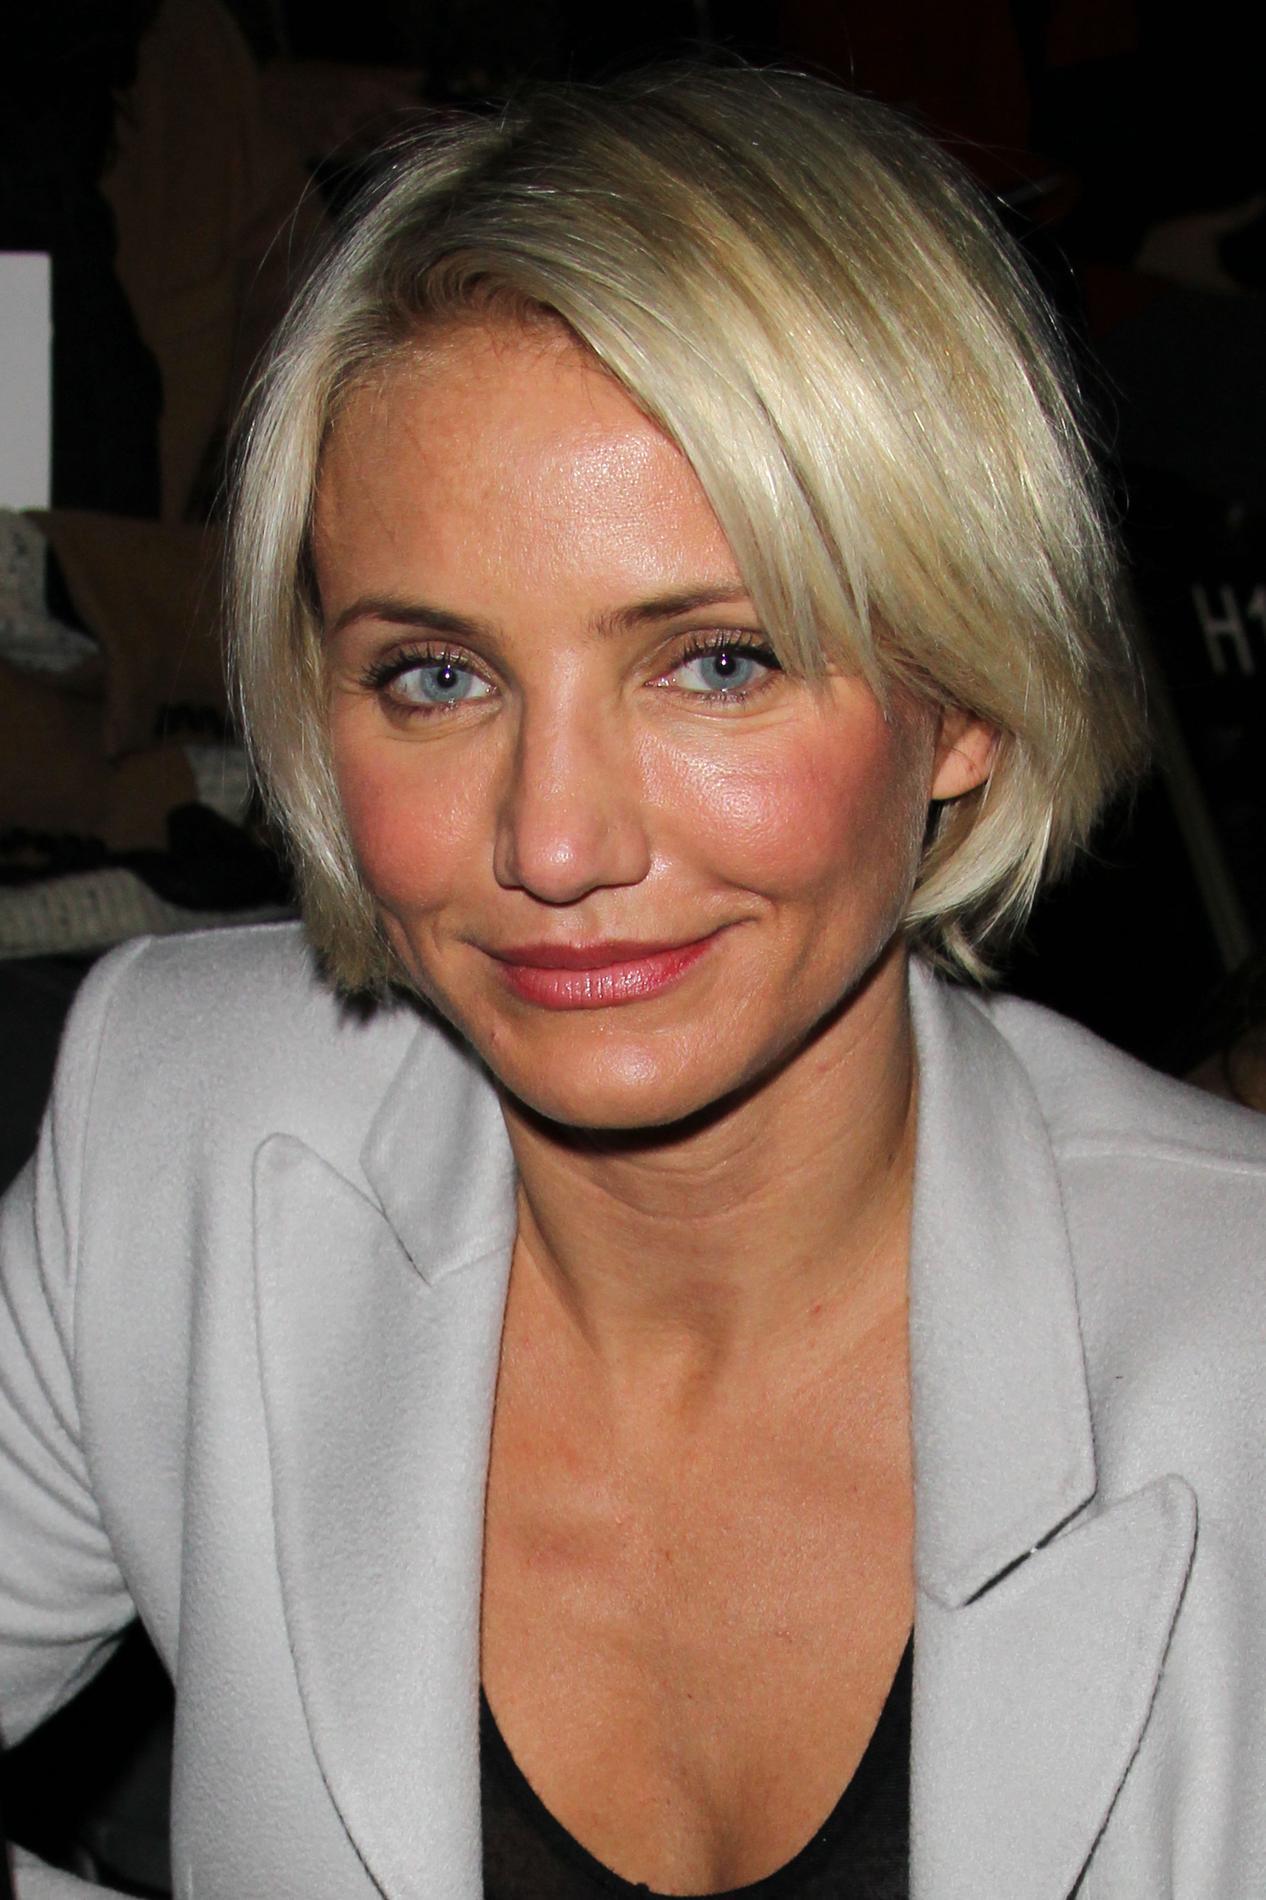 Cameron Diaz La Reine Du Blond Californien Madame Figaro